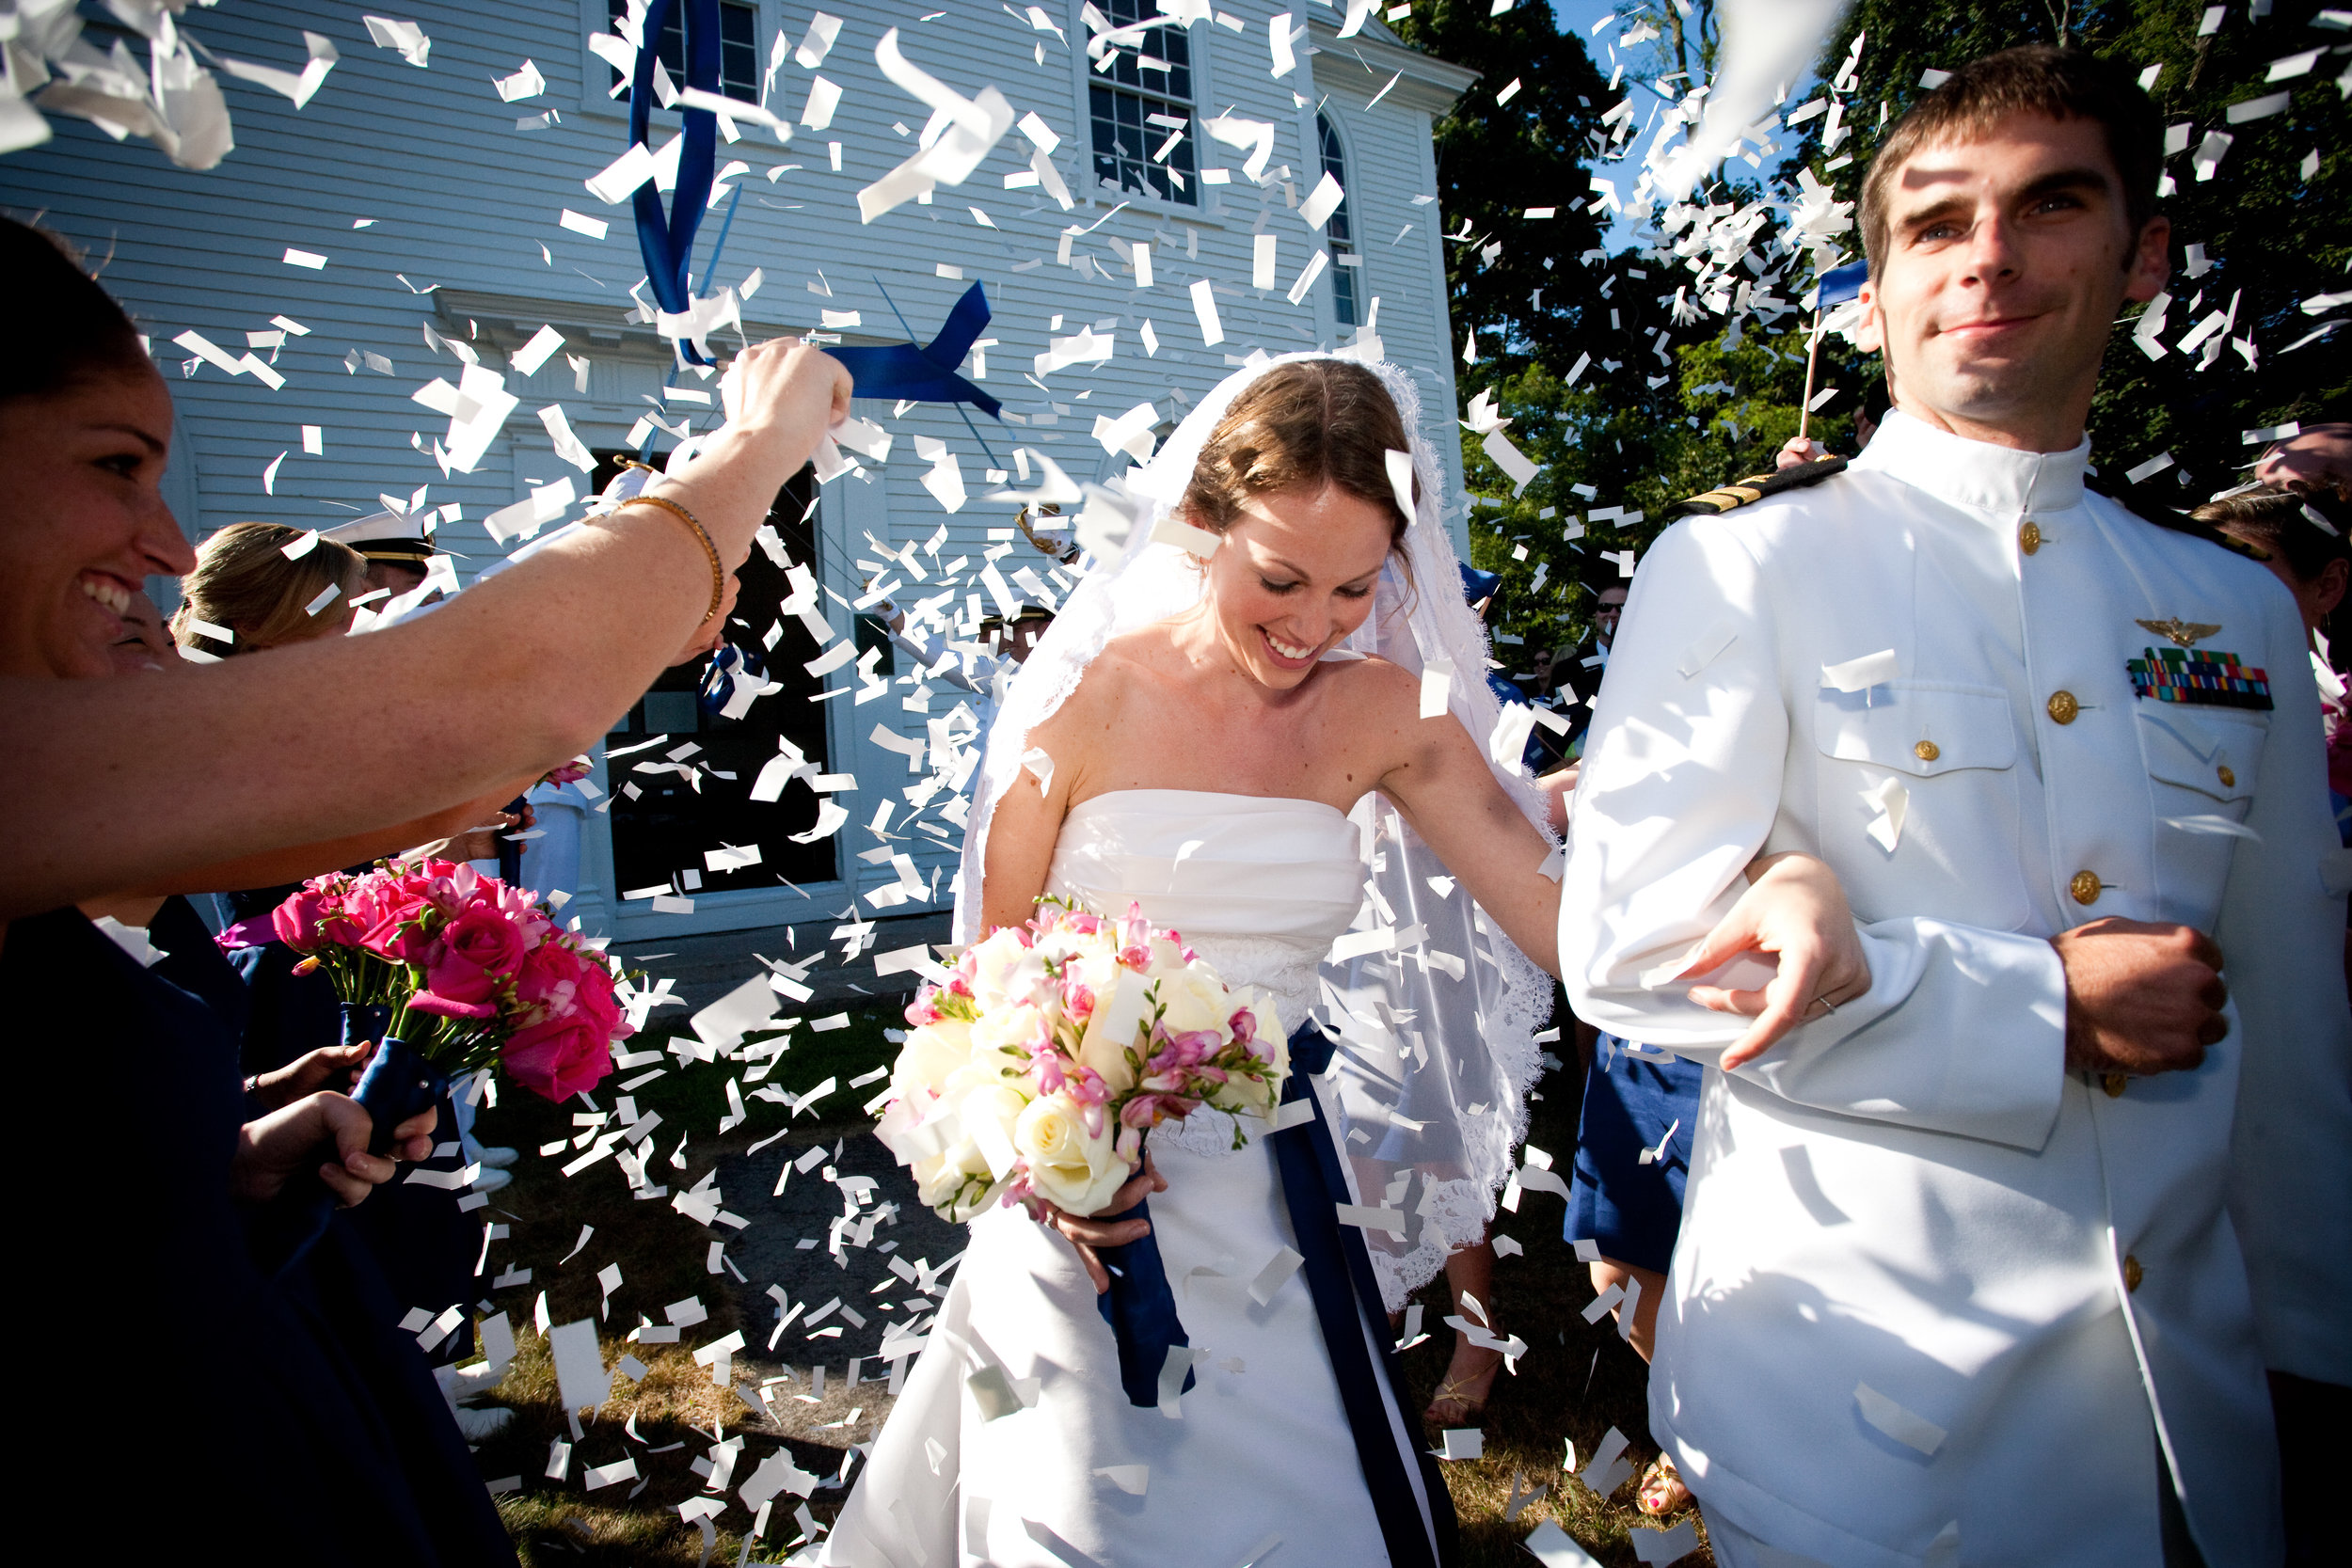 maine_wedding_geneve_hoffman_0001-14.jpg